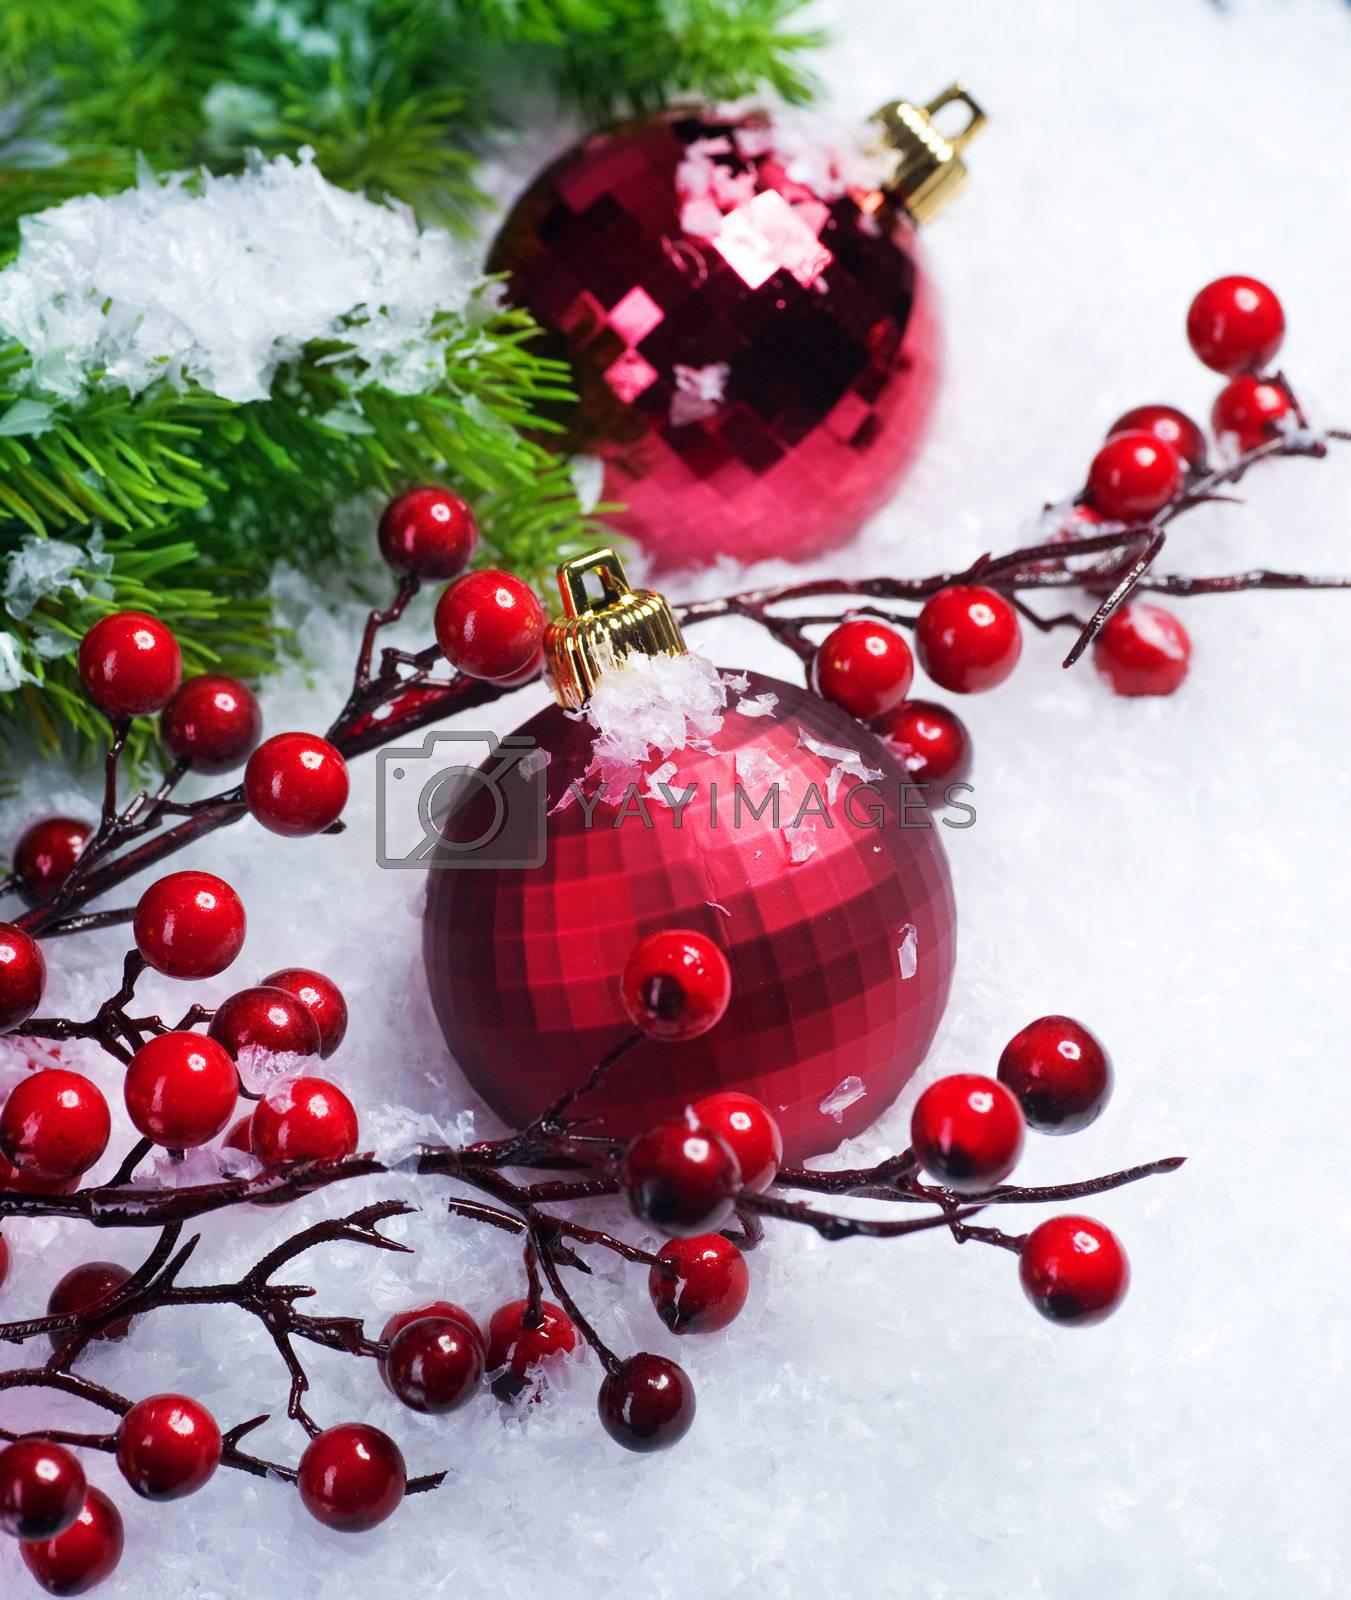 Christmas by SubbotinaA